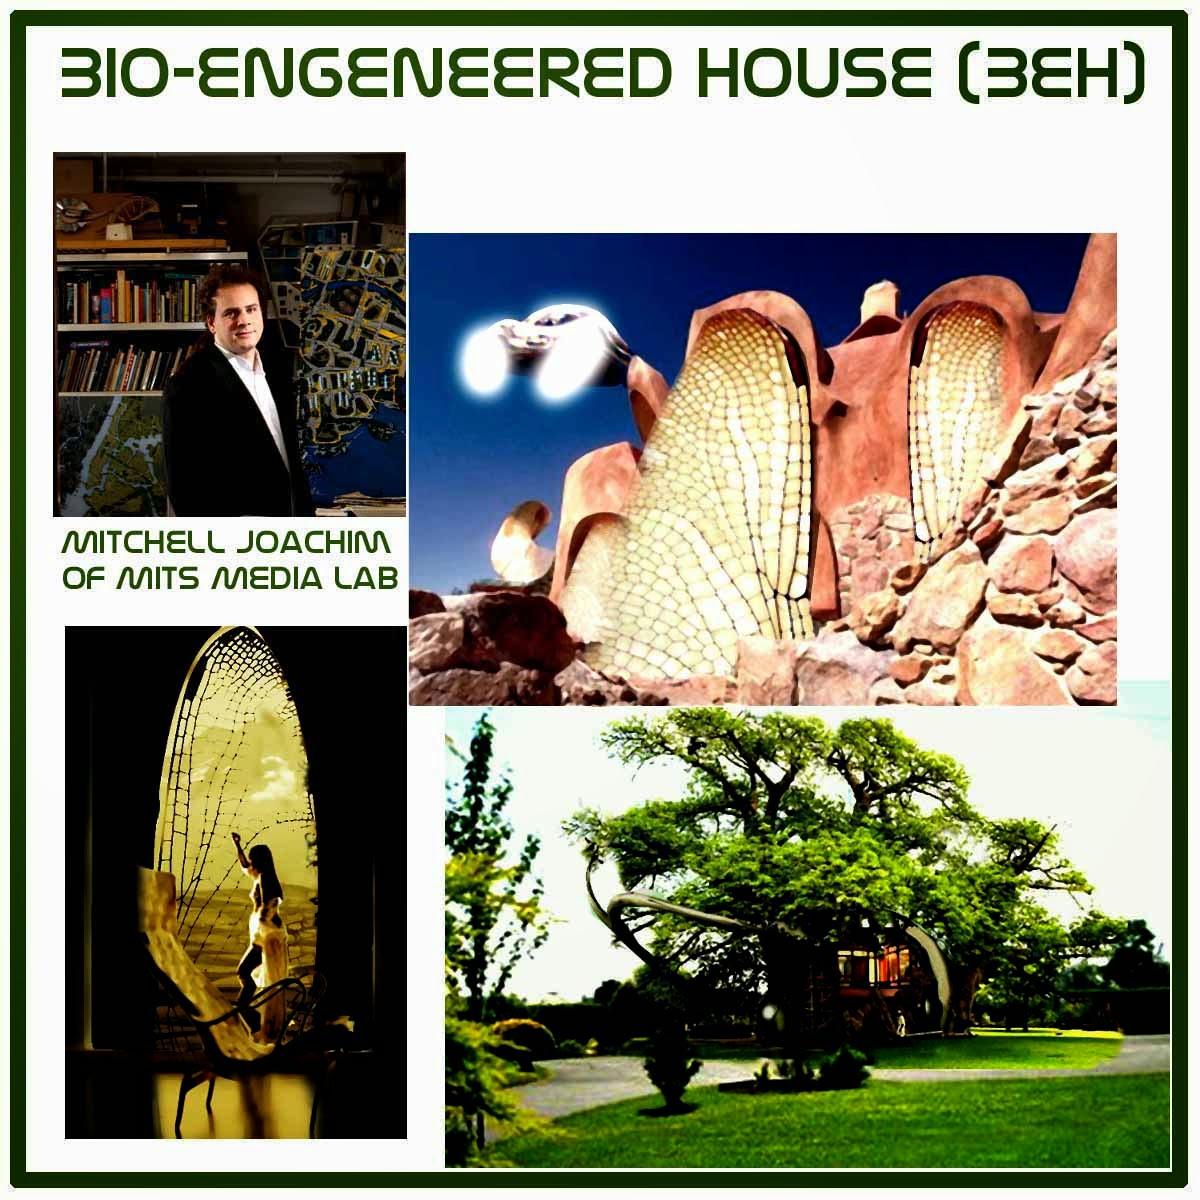 blemya bio engineered house beh. Black Bedroom Furniture Sets. Home Design Ideas